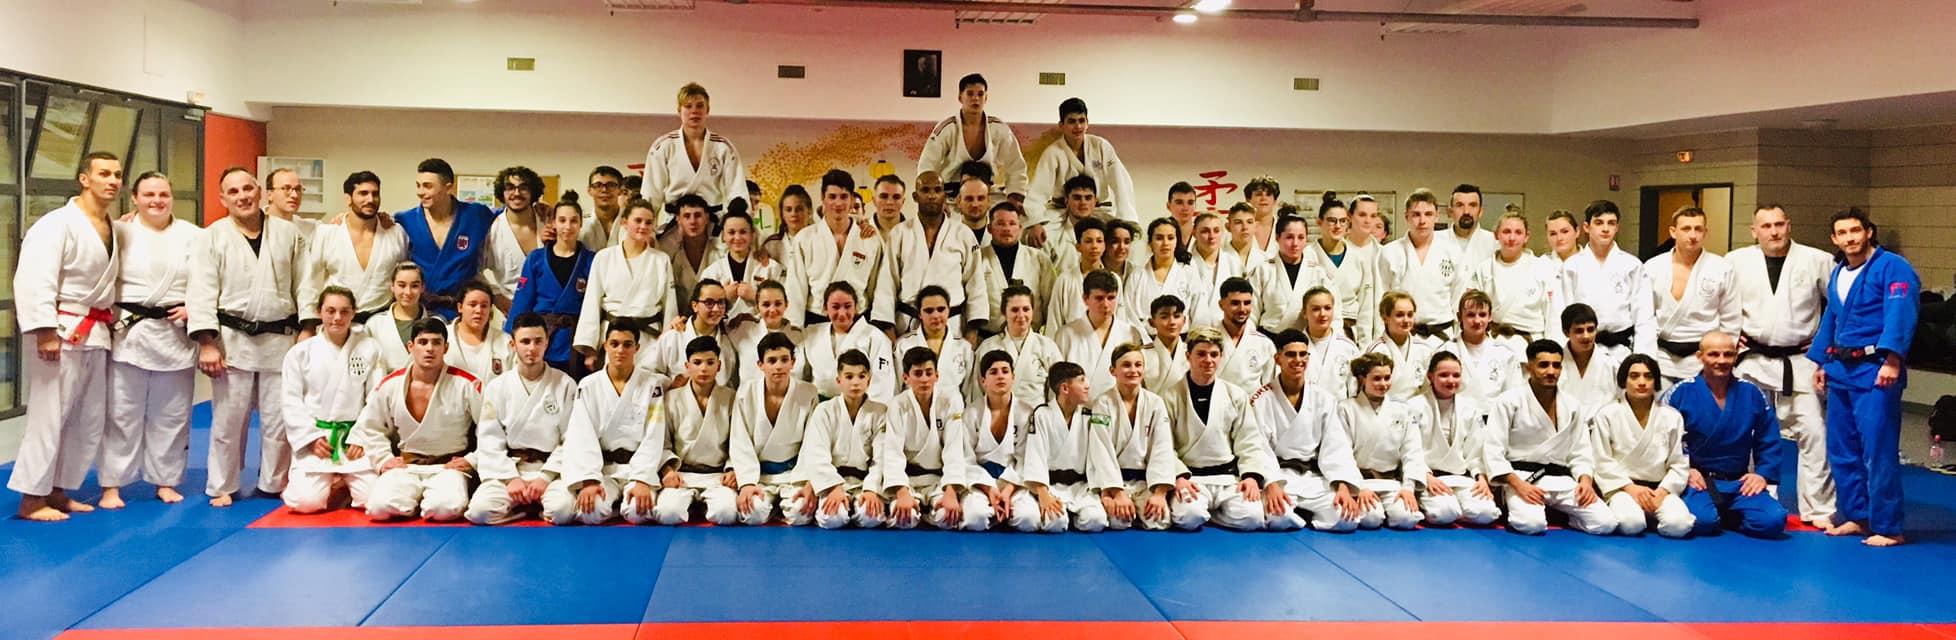 Interreg Judo Training Saint Julien-les-Metz - 07.02.2019